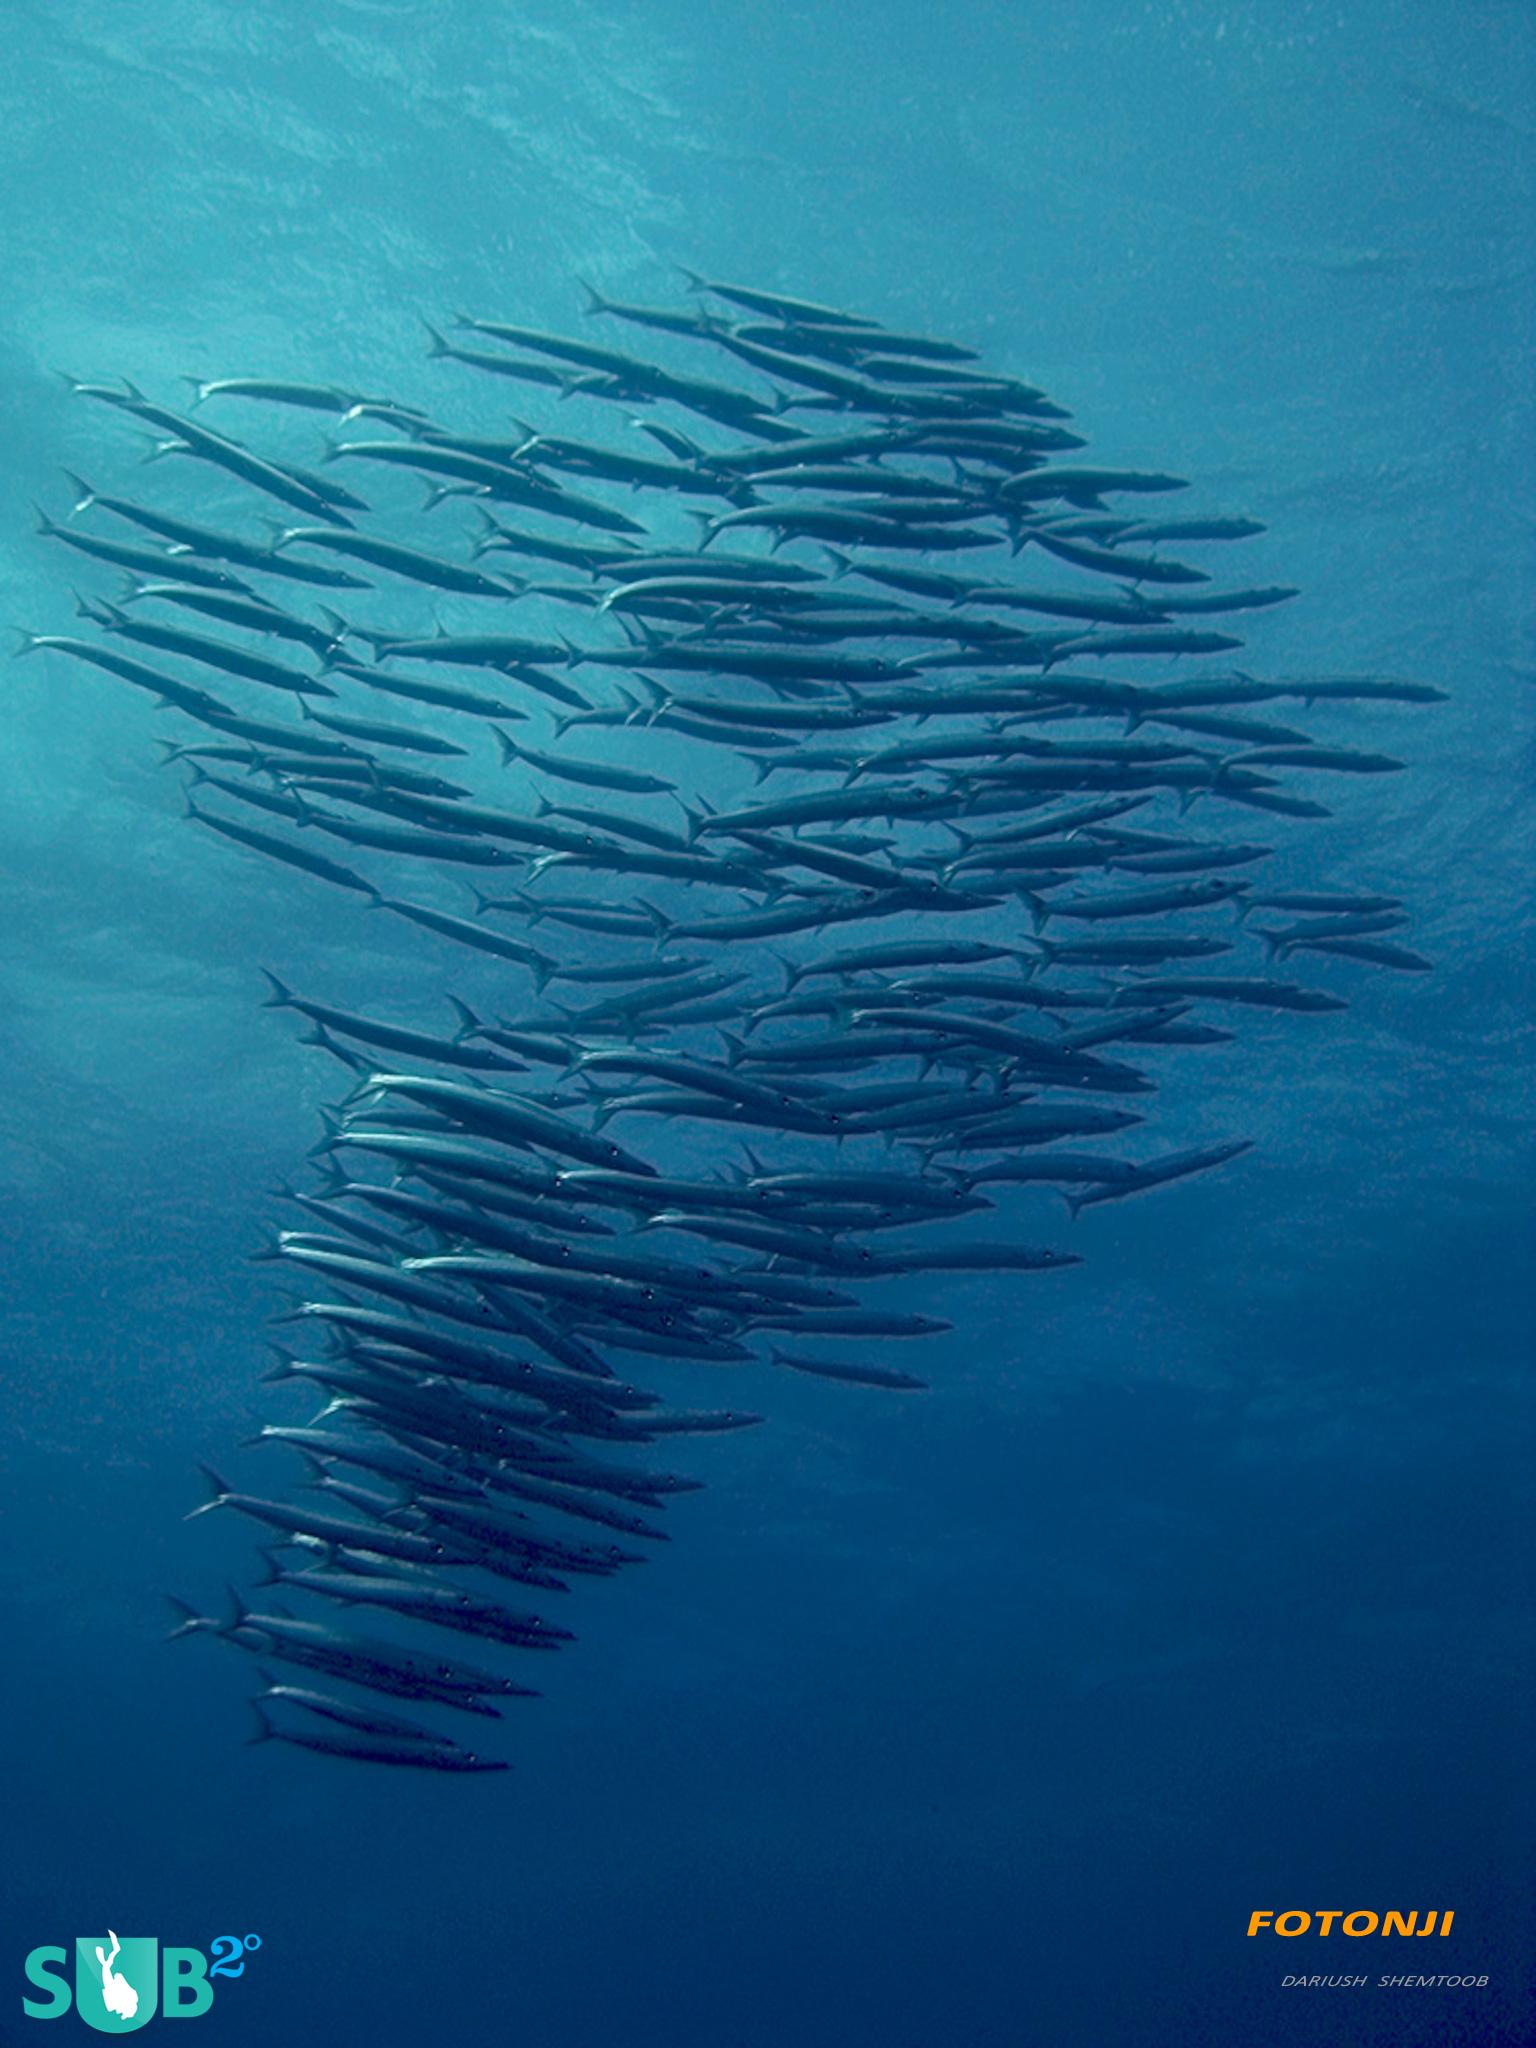 A School of Barracuda